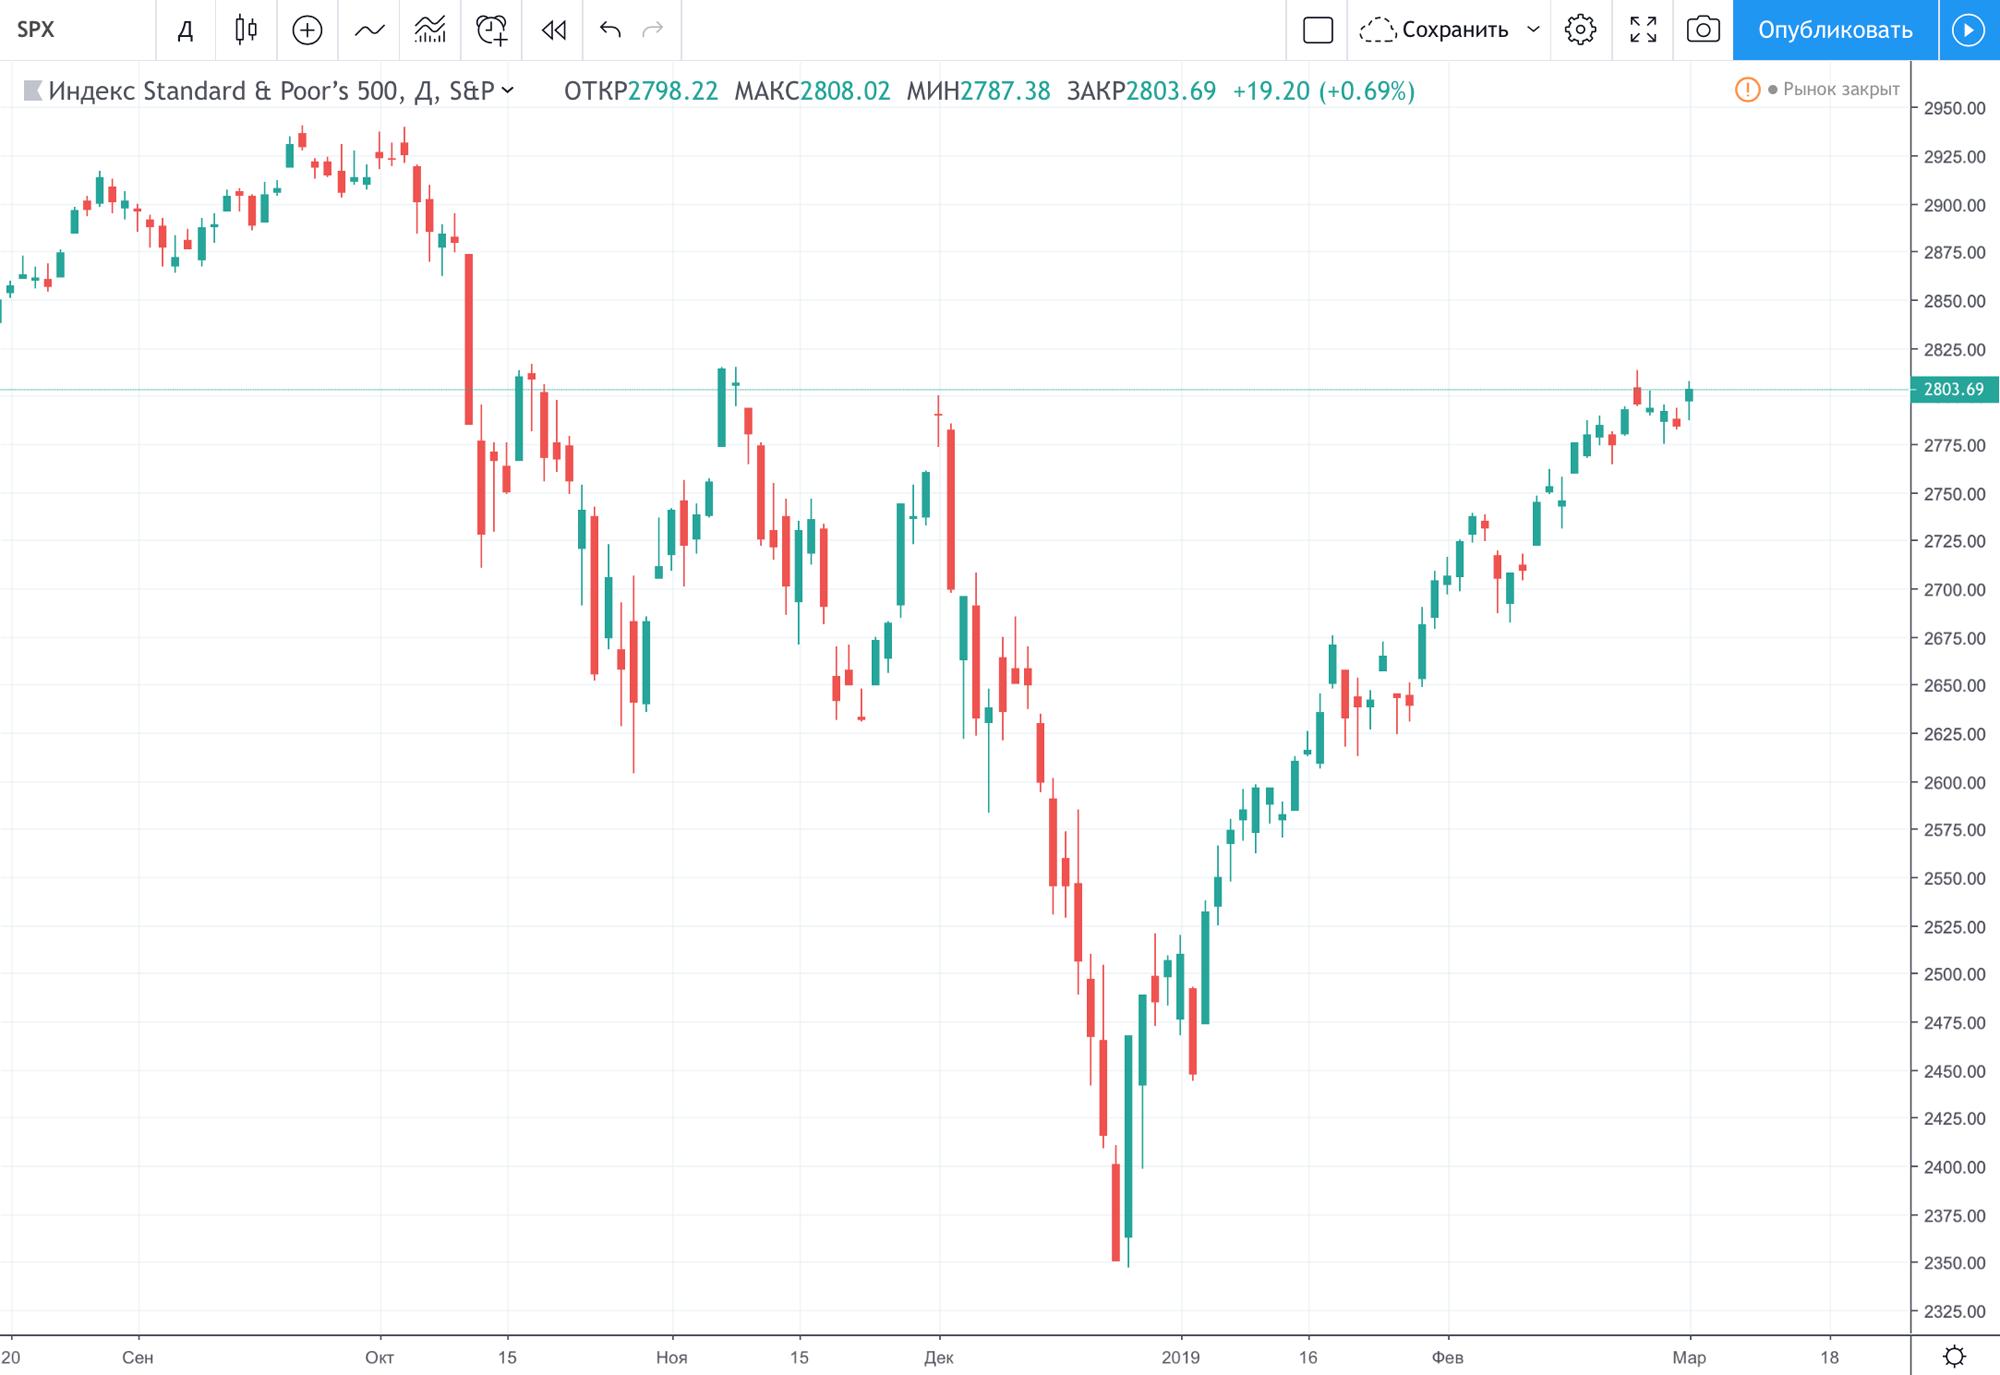 Поведение индекса S&P; 500 во второй половине 2018 и начале 2019 года. Хорошо видно ралли с конца декабря. График: Tradingview